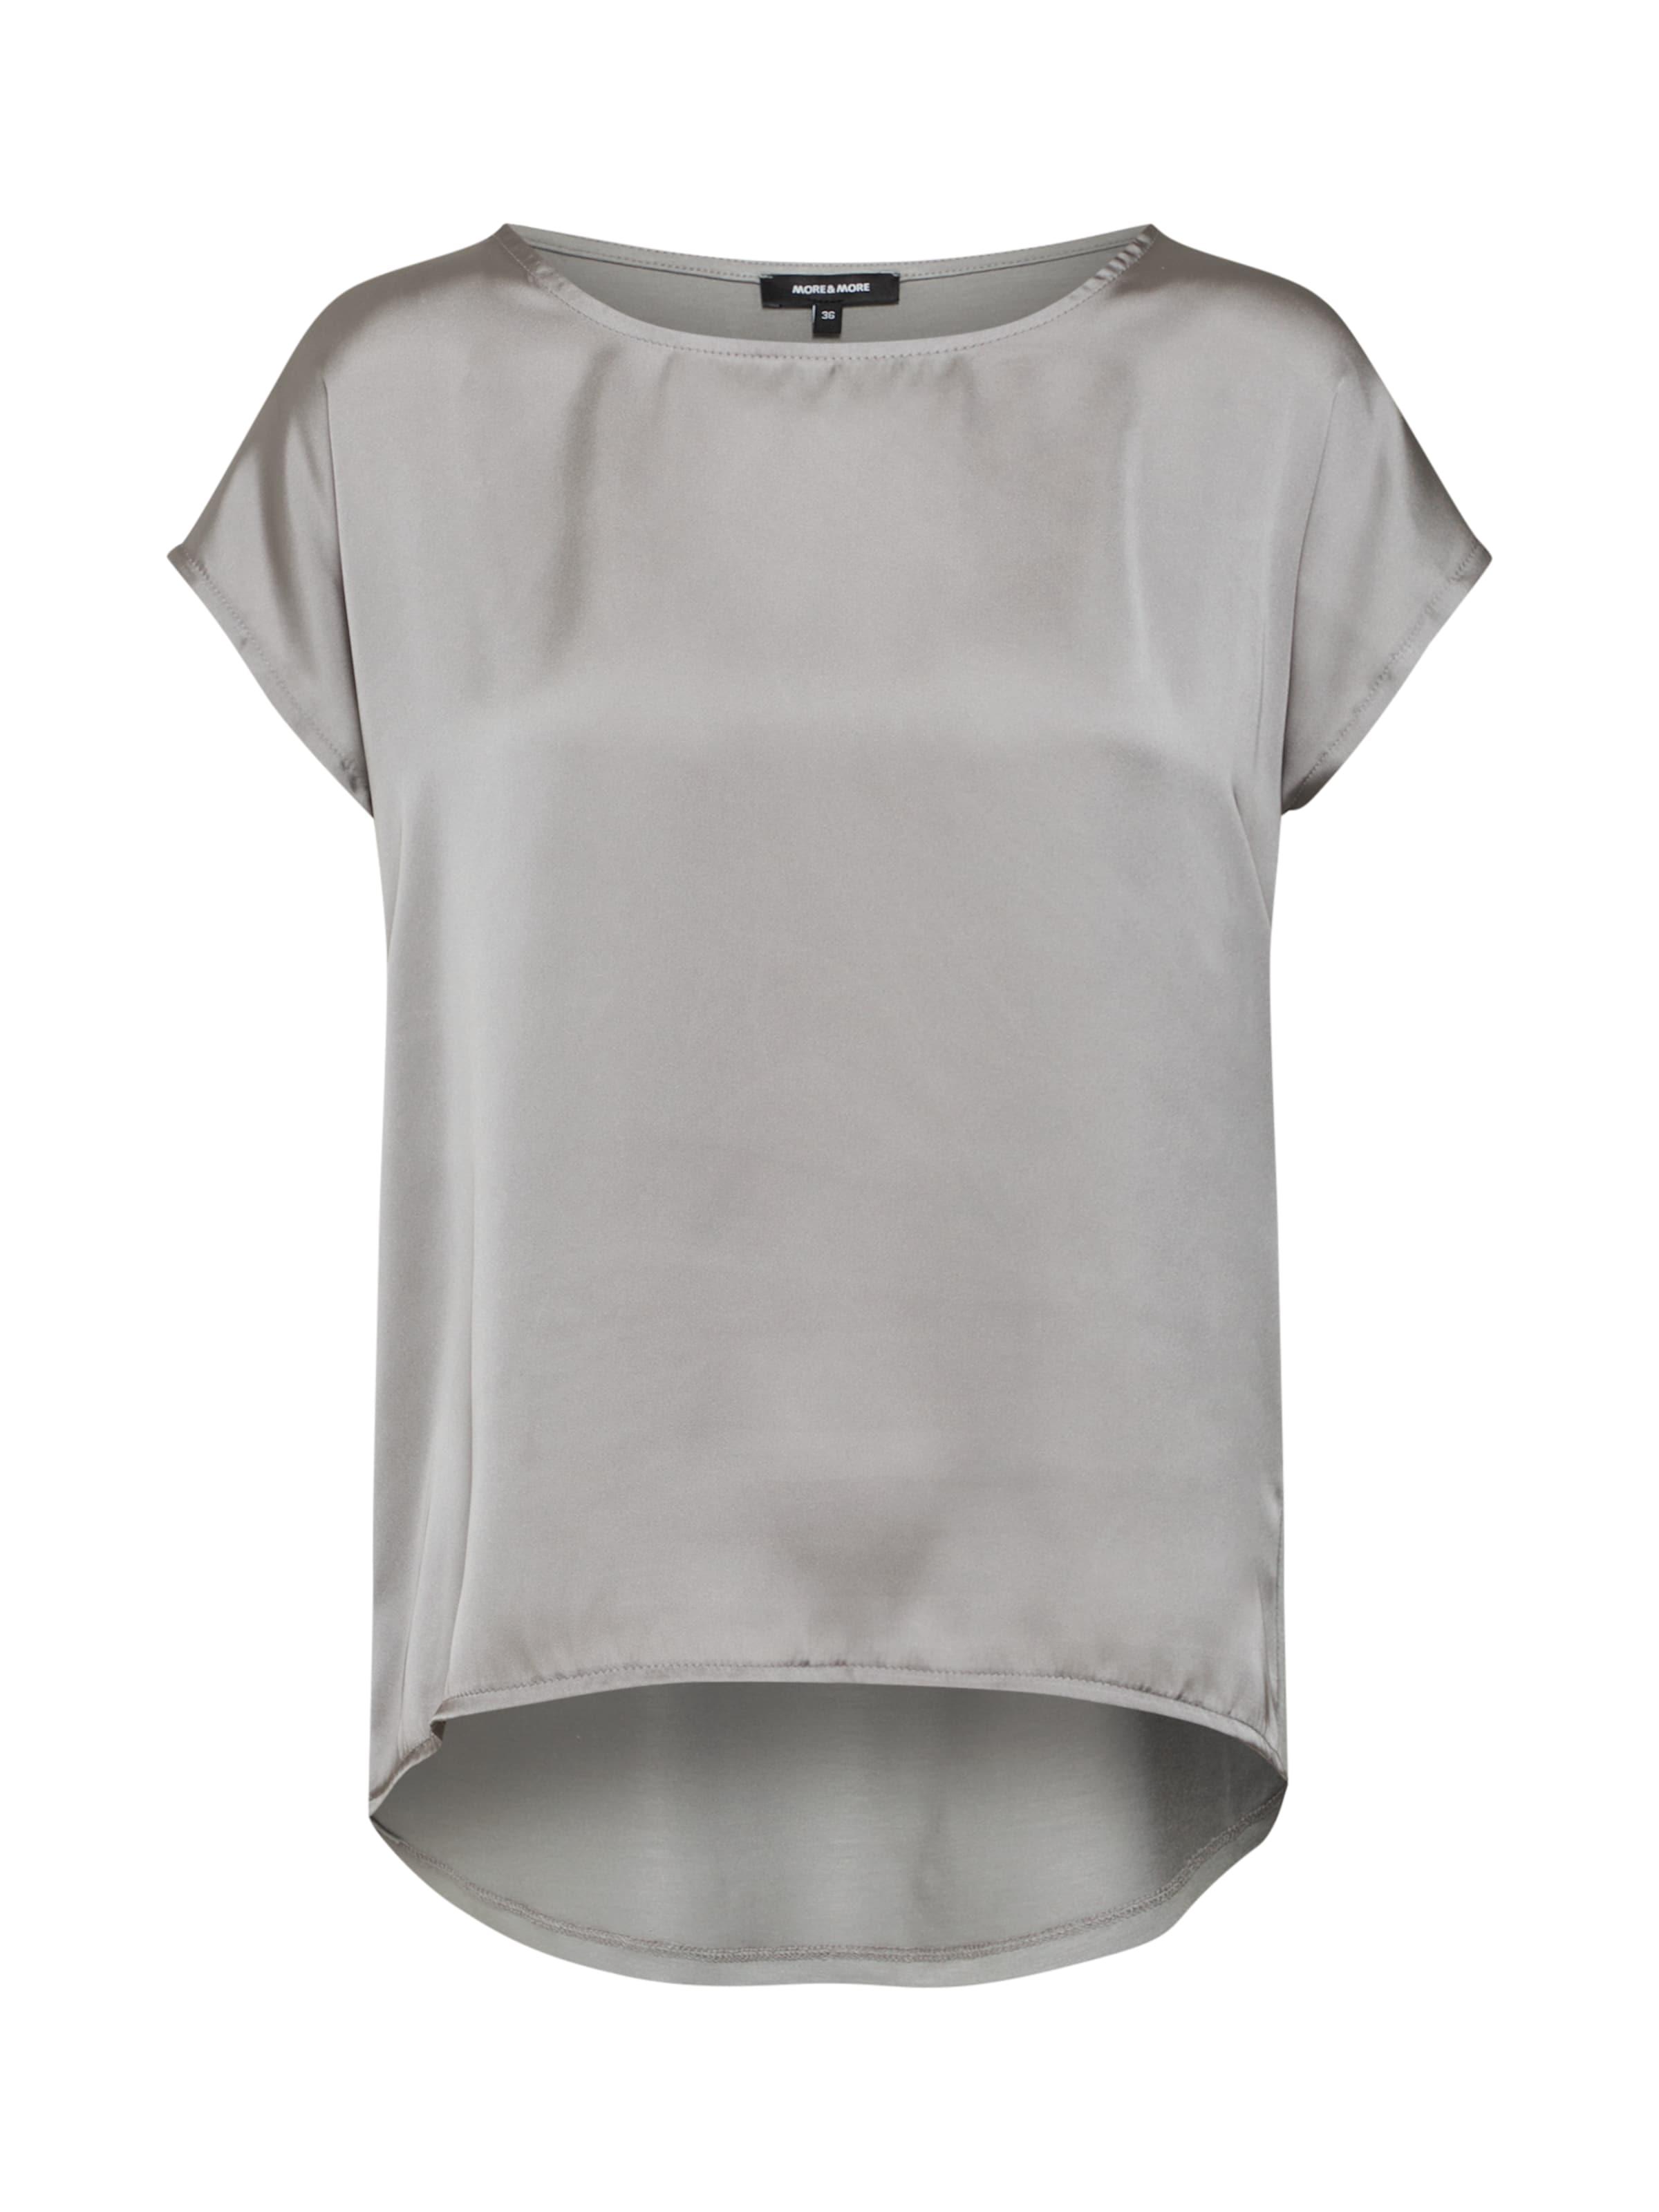 In Shirt Moreamp; Grau In Moreamp; Shirt ZPikOXTlwu